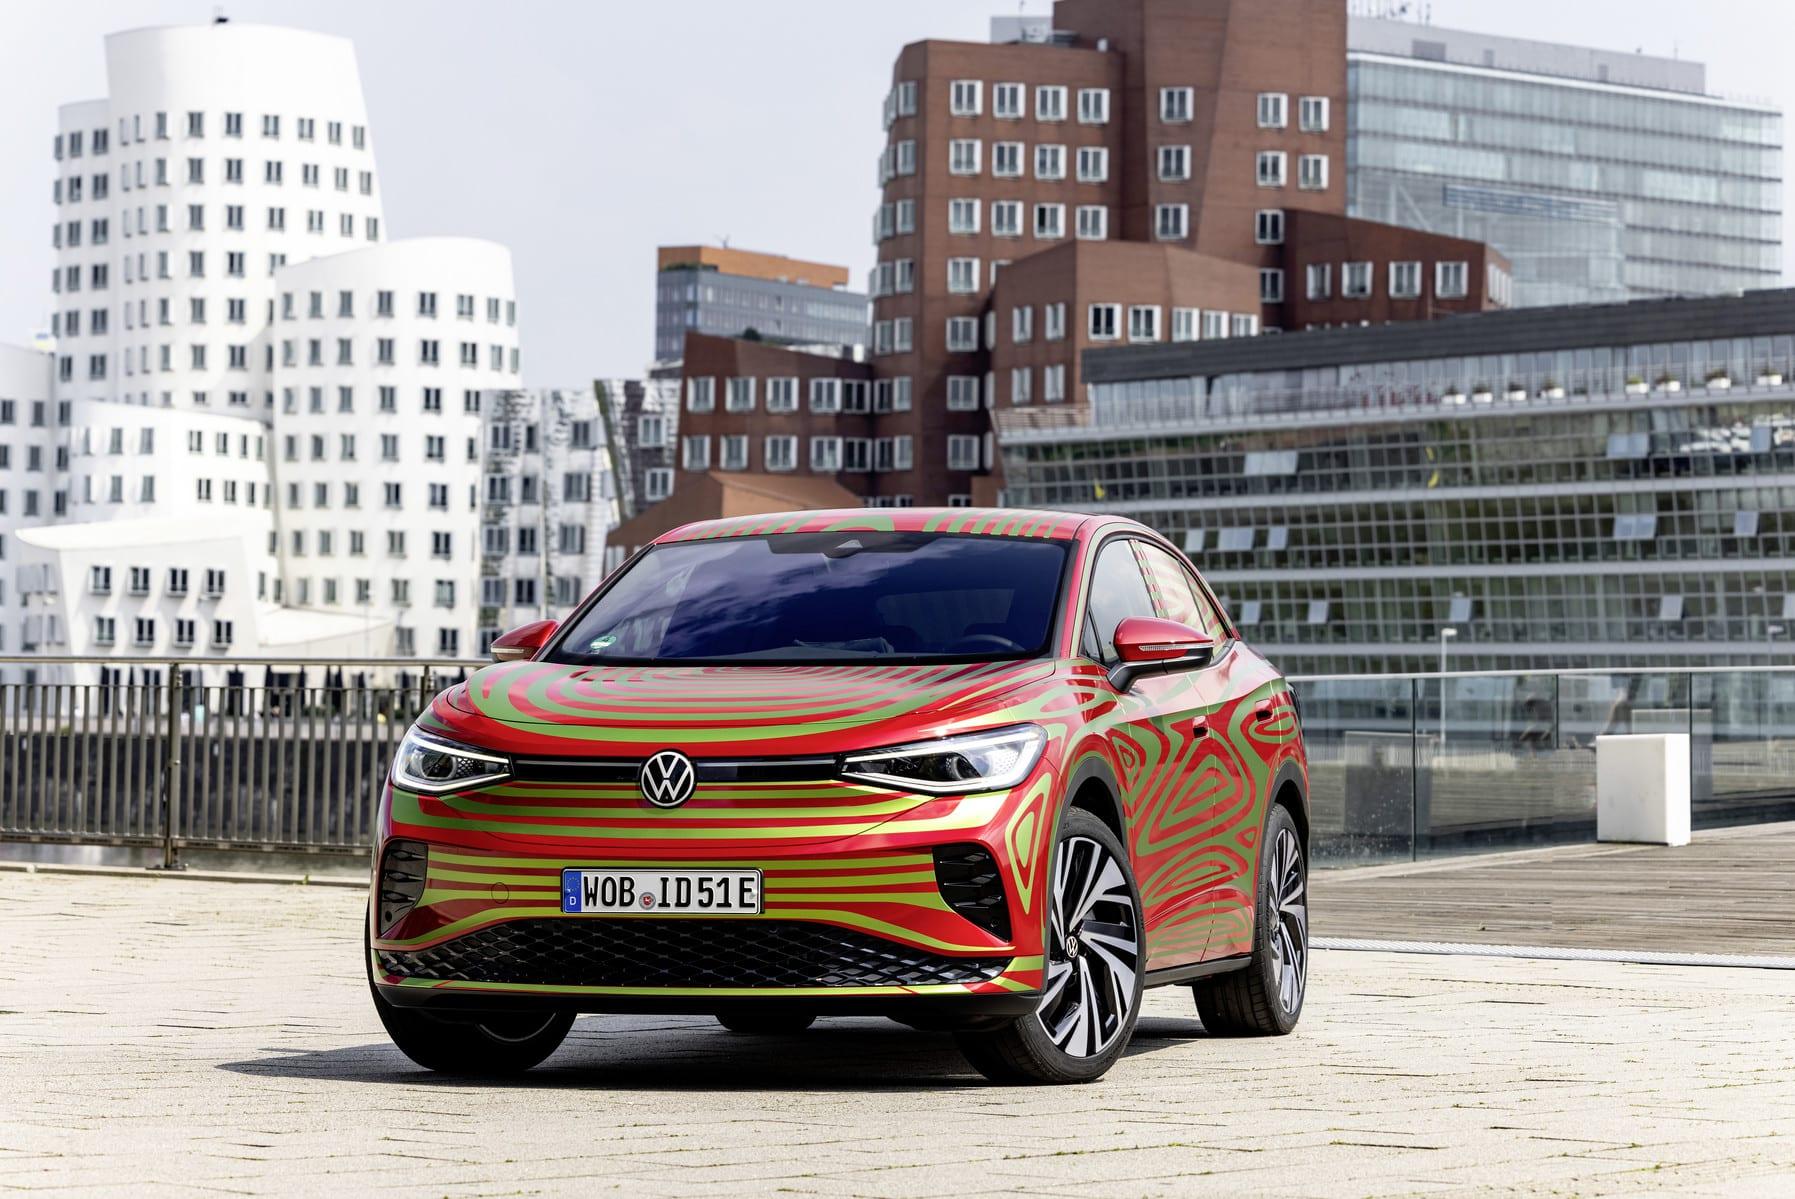 Volkswagen ID.5 GTX debutará en Múnich